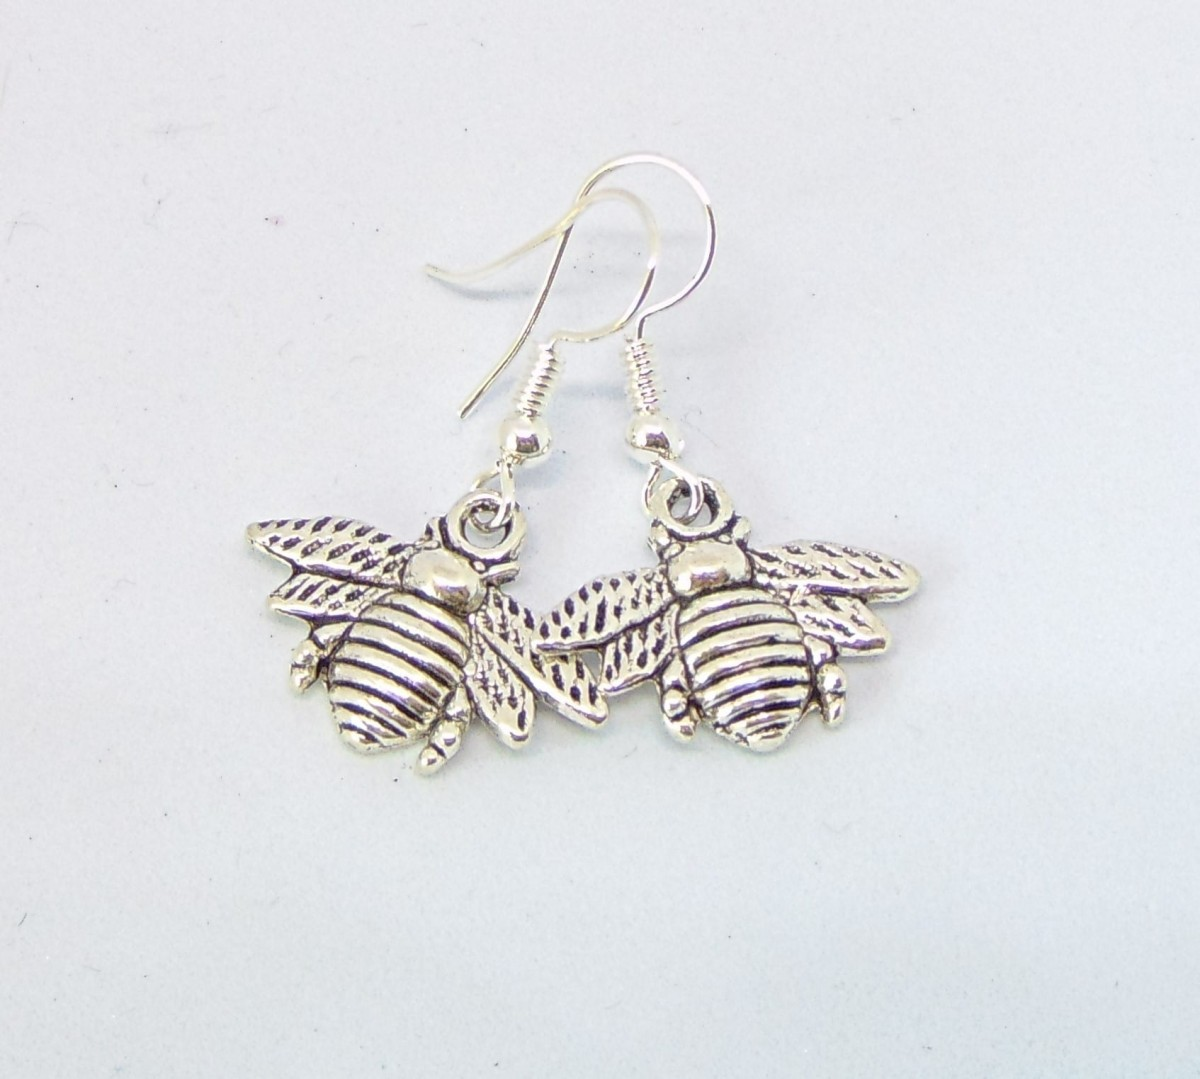 Honey Bee Earrings at Henley Circle Online Shop